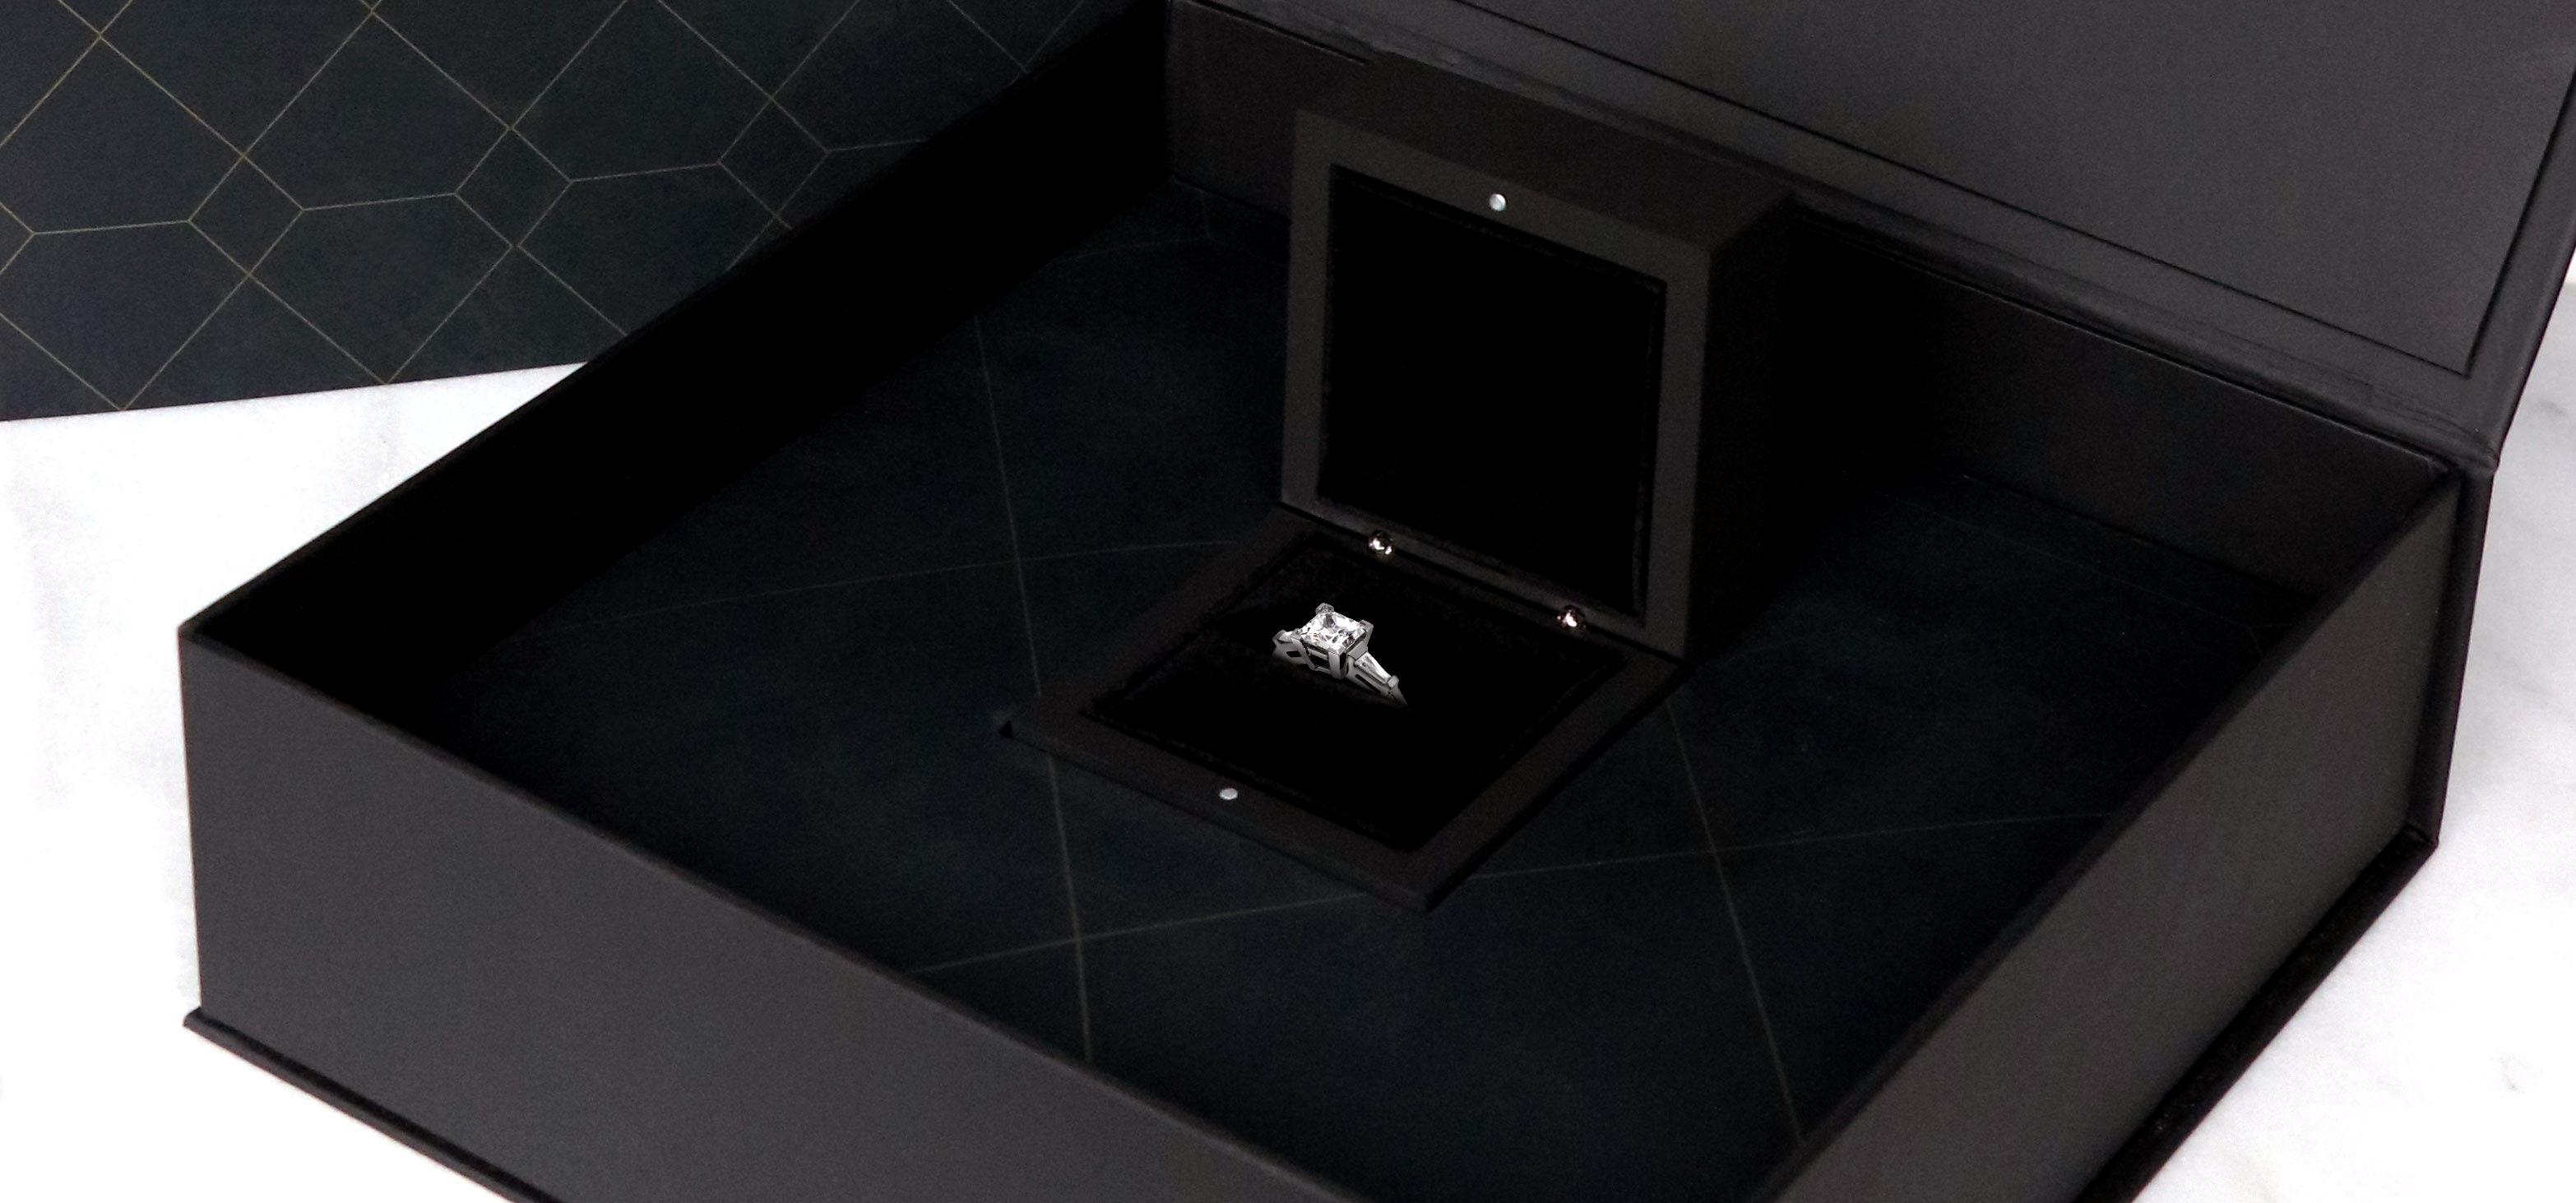 Diamond Nexus engagement ring shown in black, luxury packaging